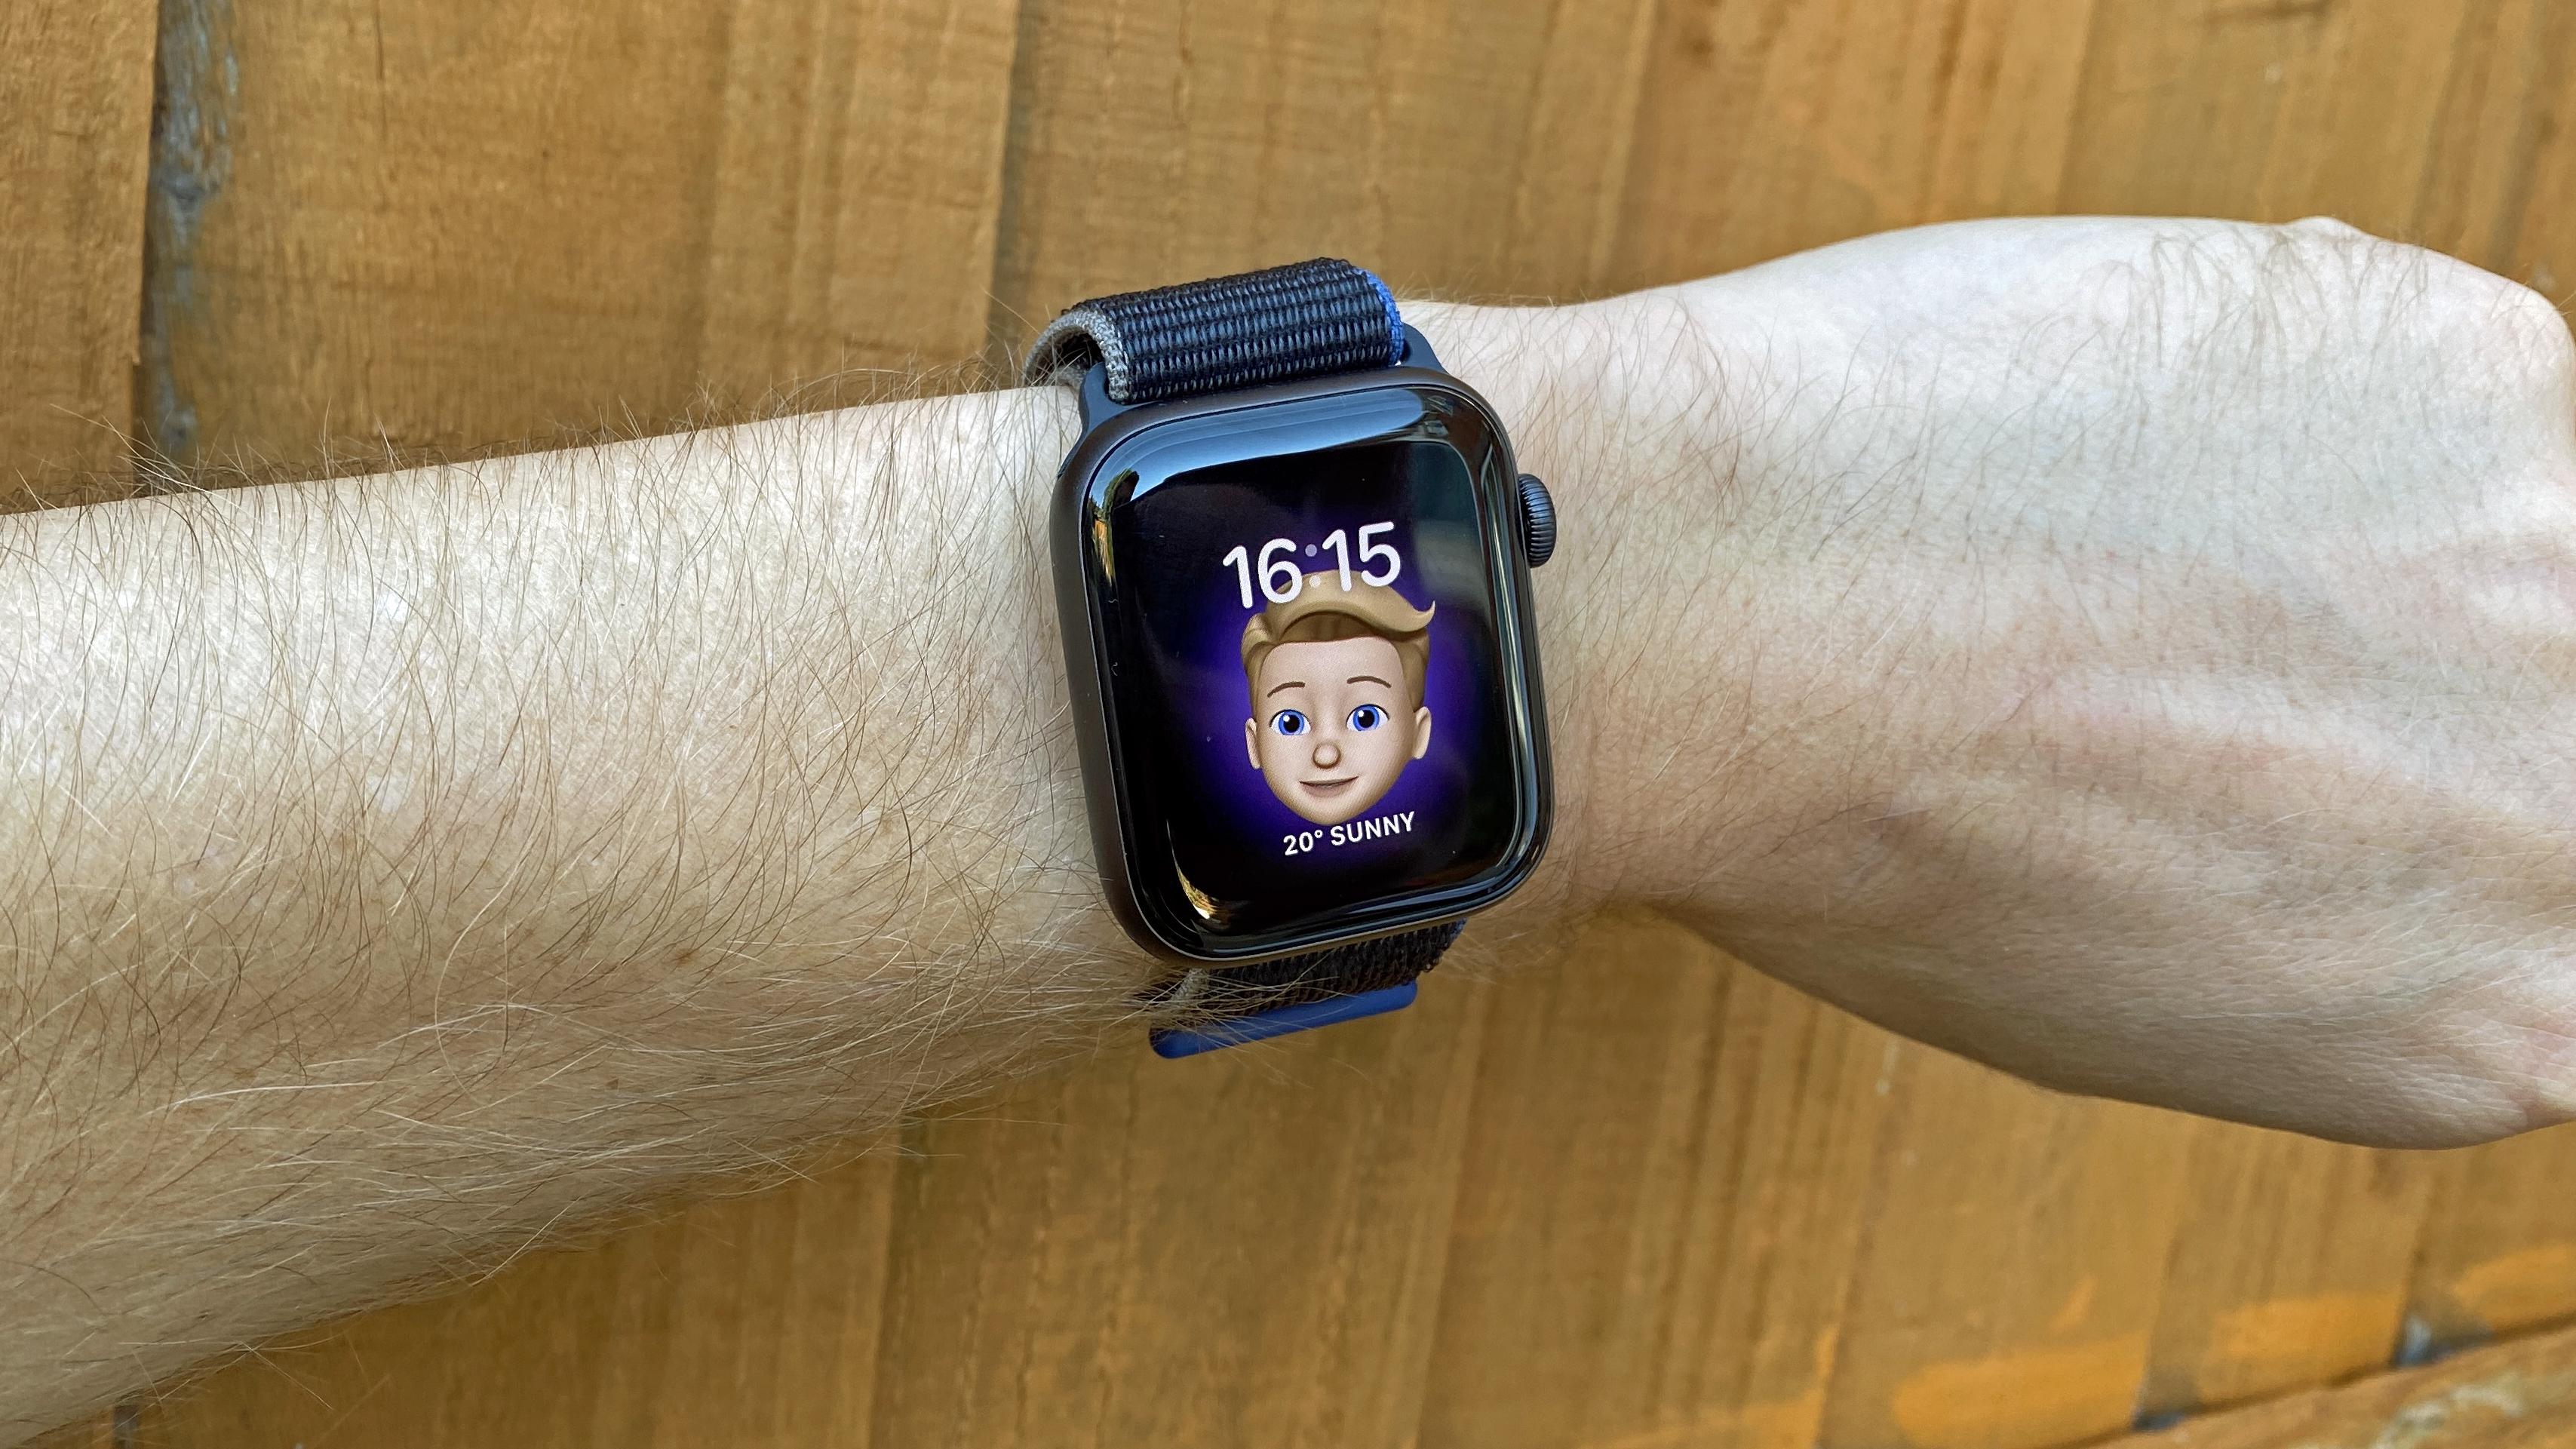 Apple Watch SE review: the smartwatch's Memoji watch face